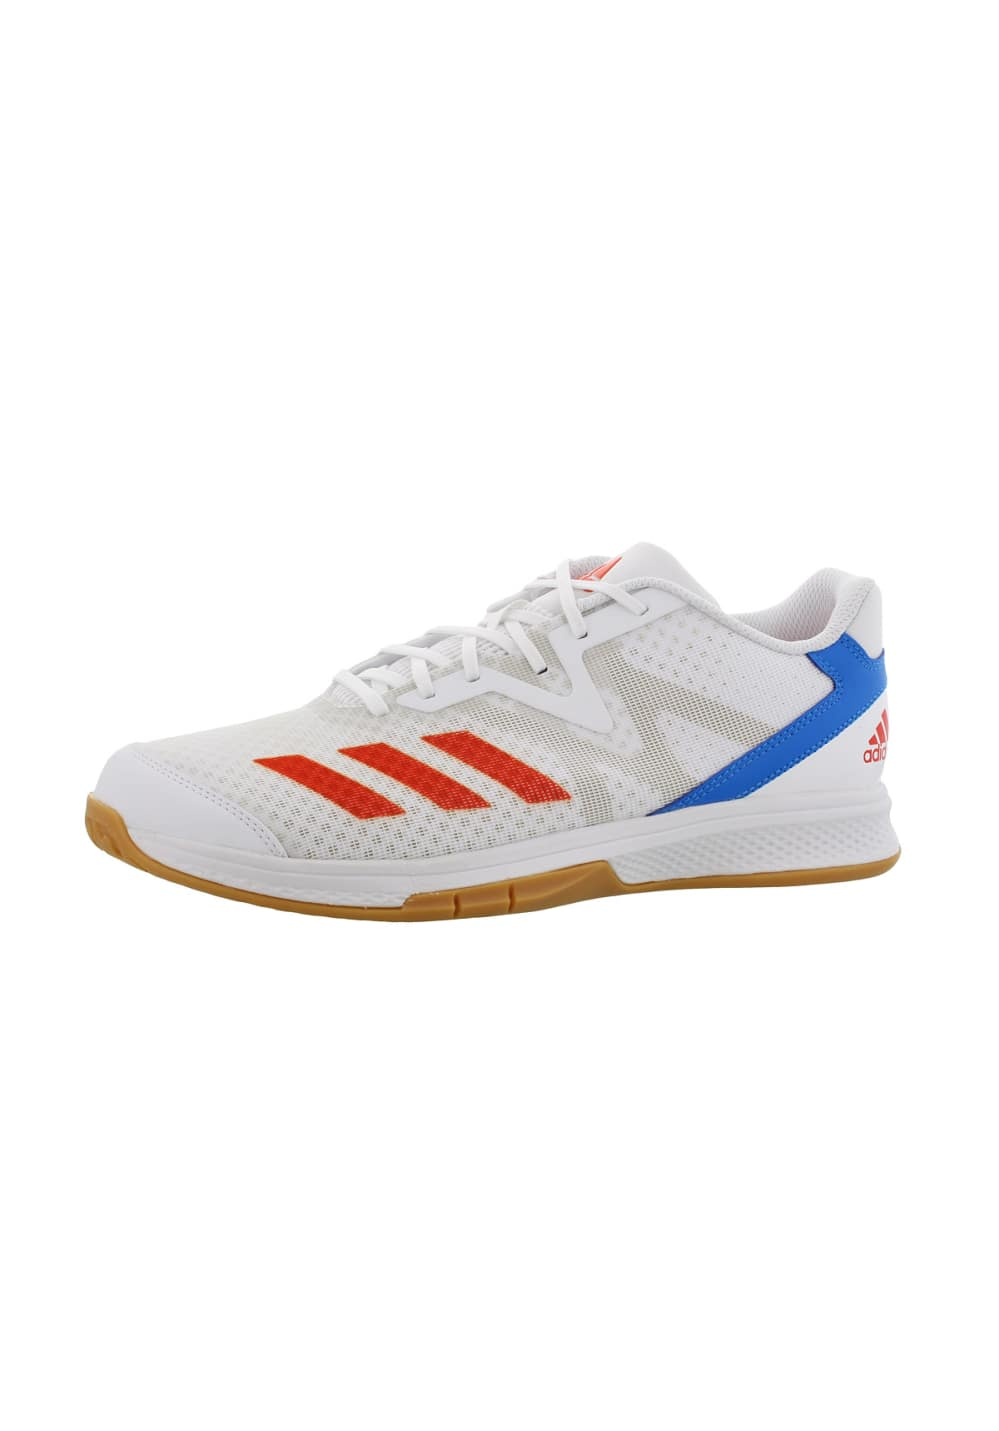 new arrival 7a350 aebb9 Next. adidas. Counterblast Exadic - Handball shoes for Men